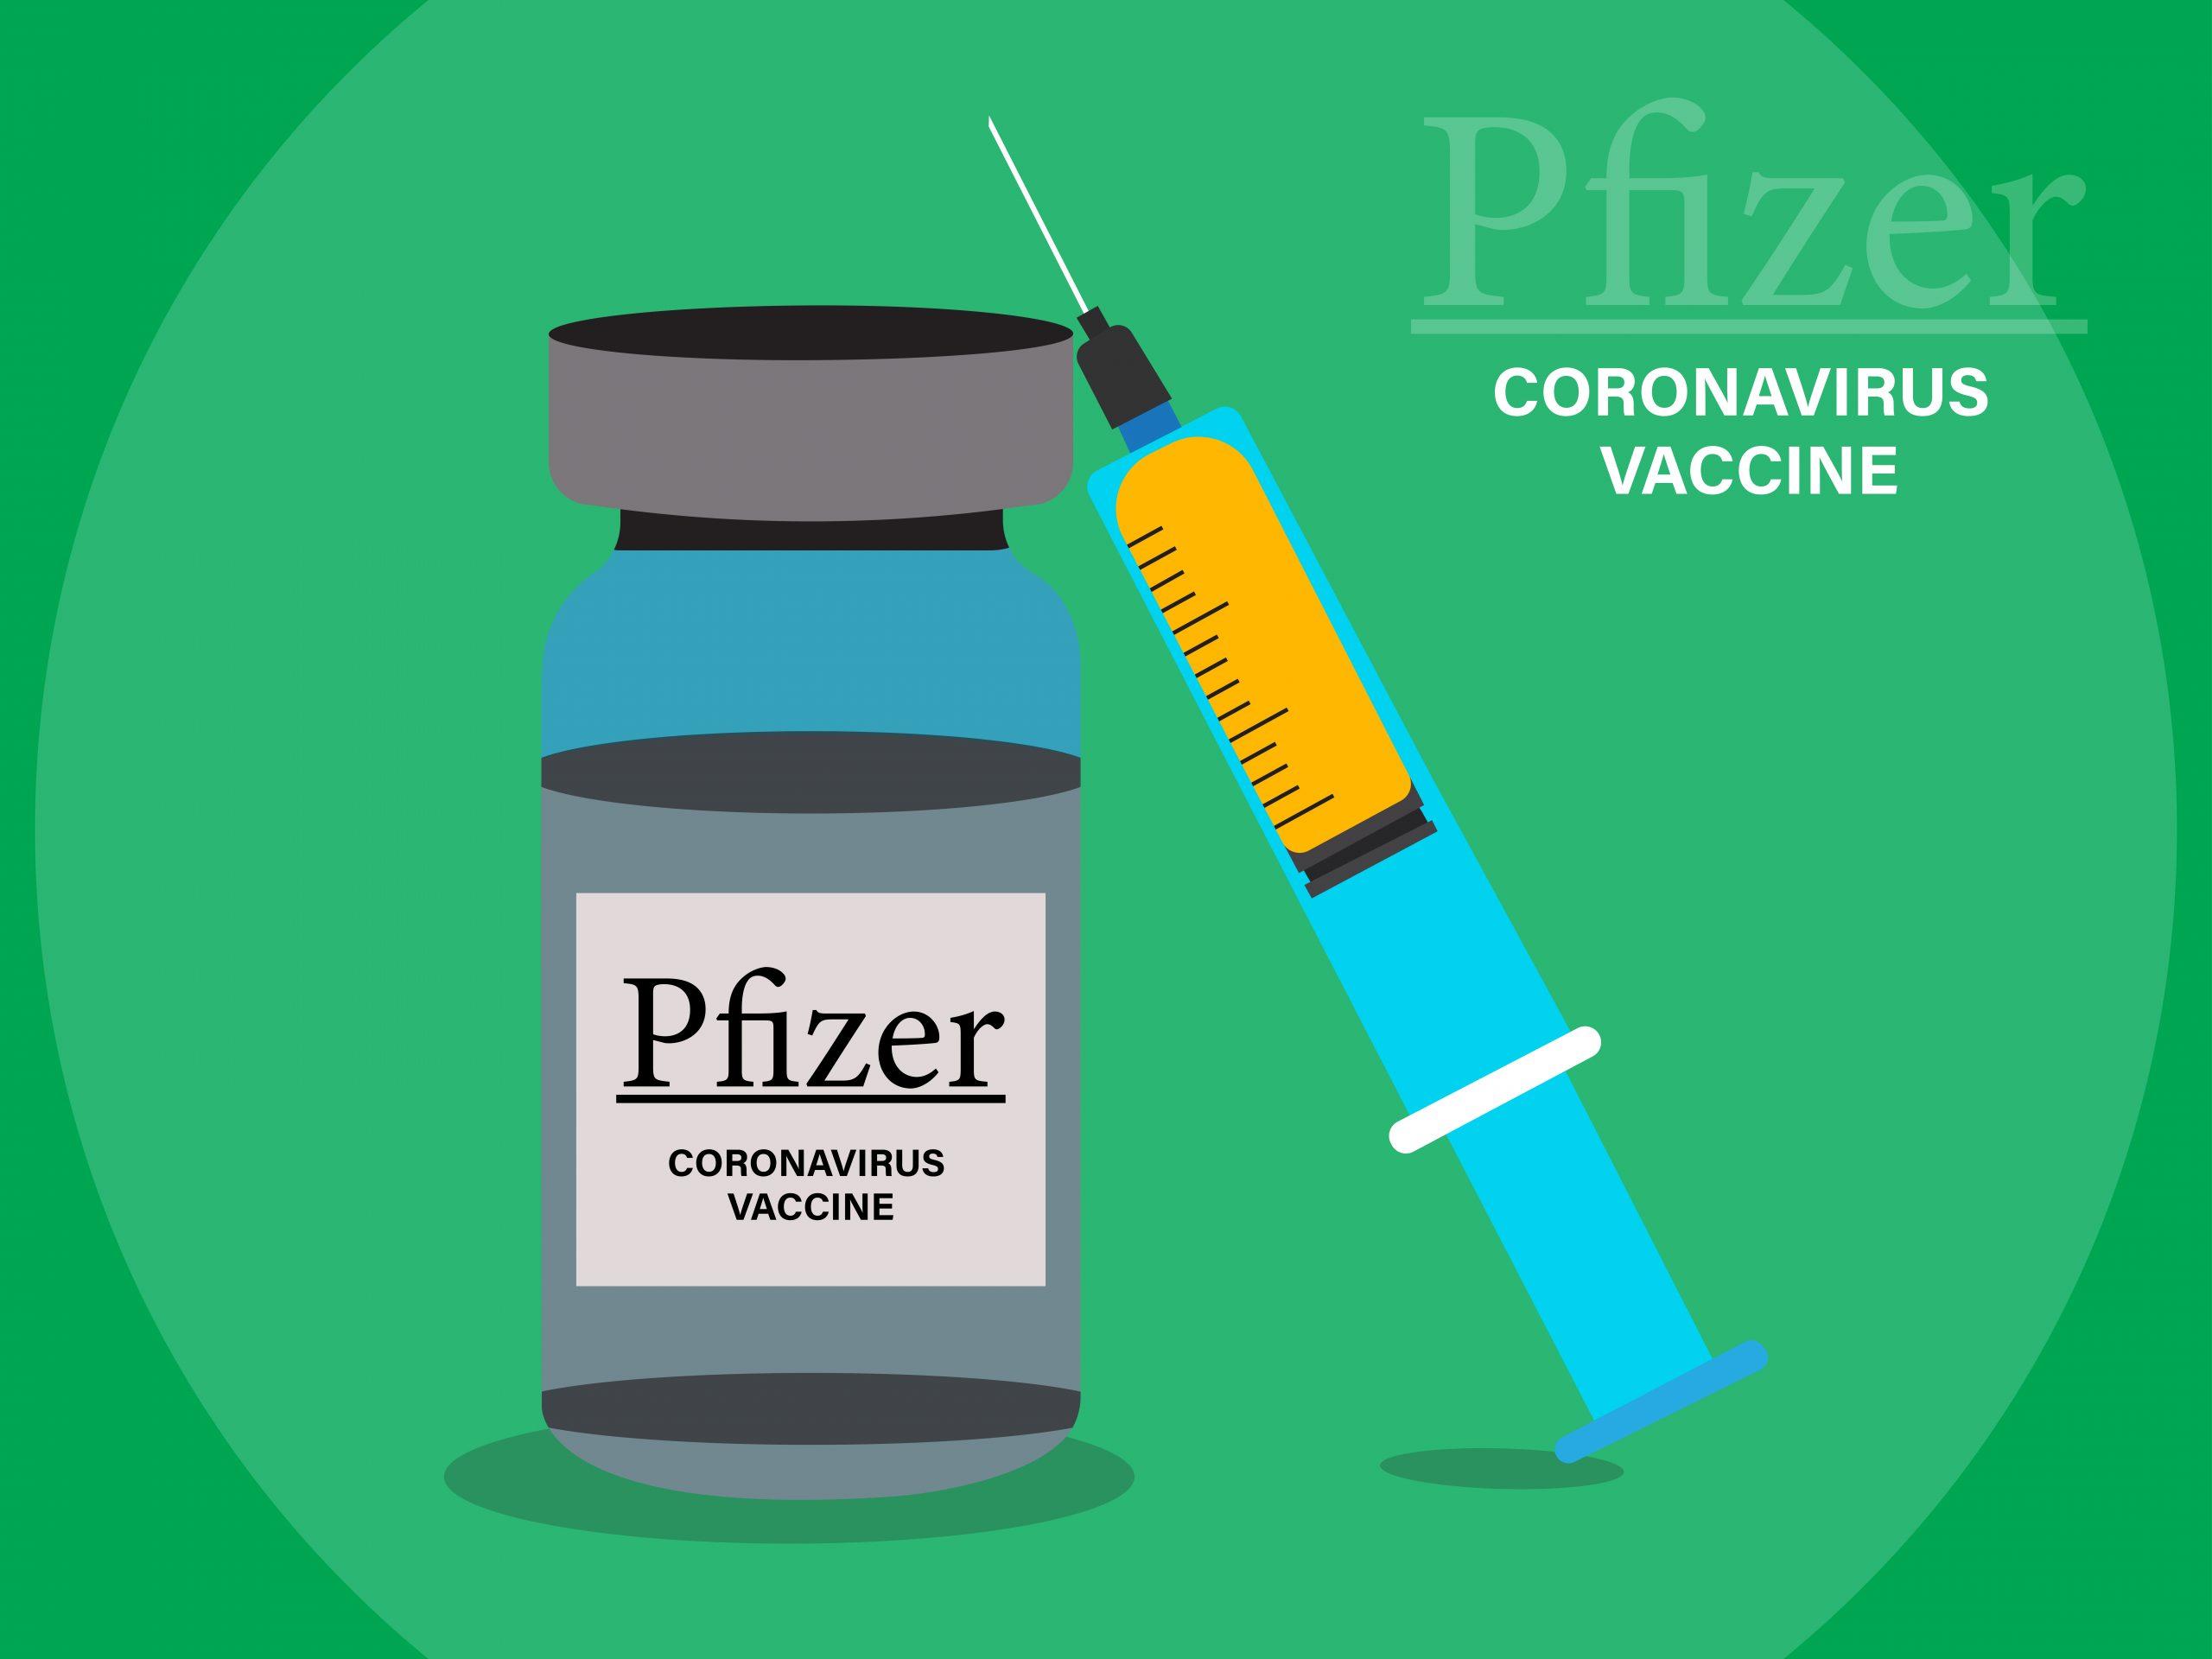 Pfizer-vaccine-illustration